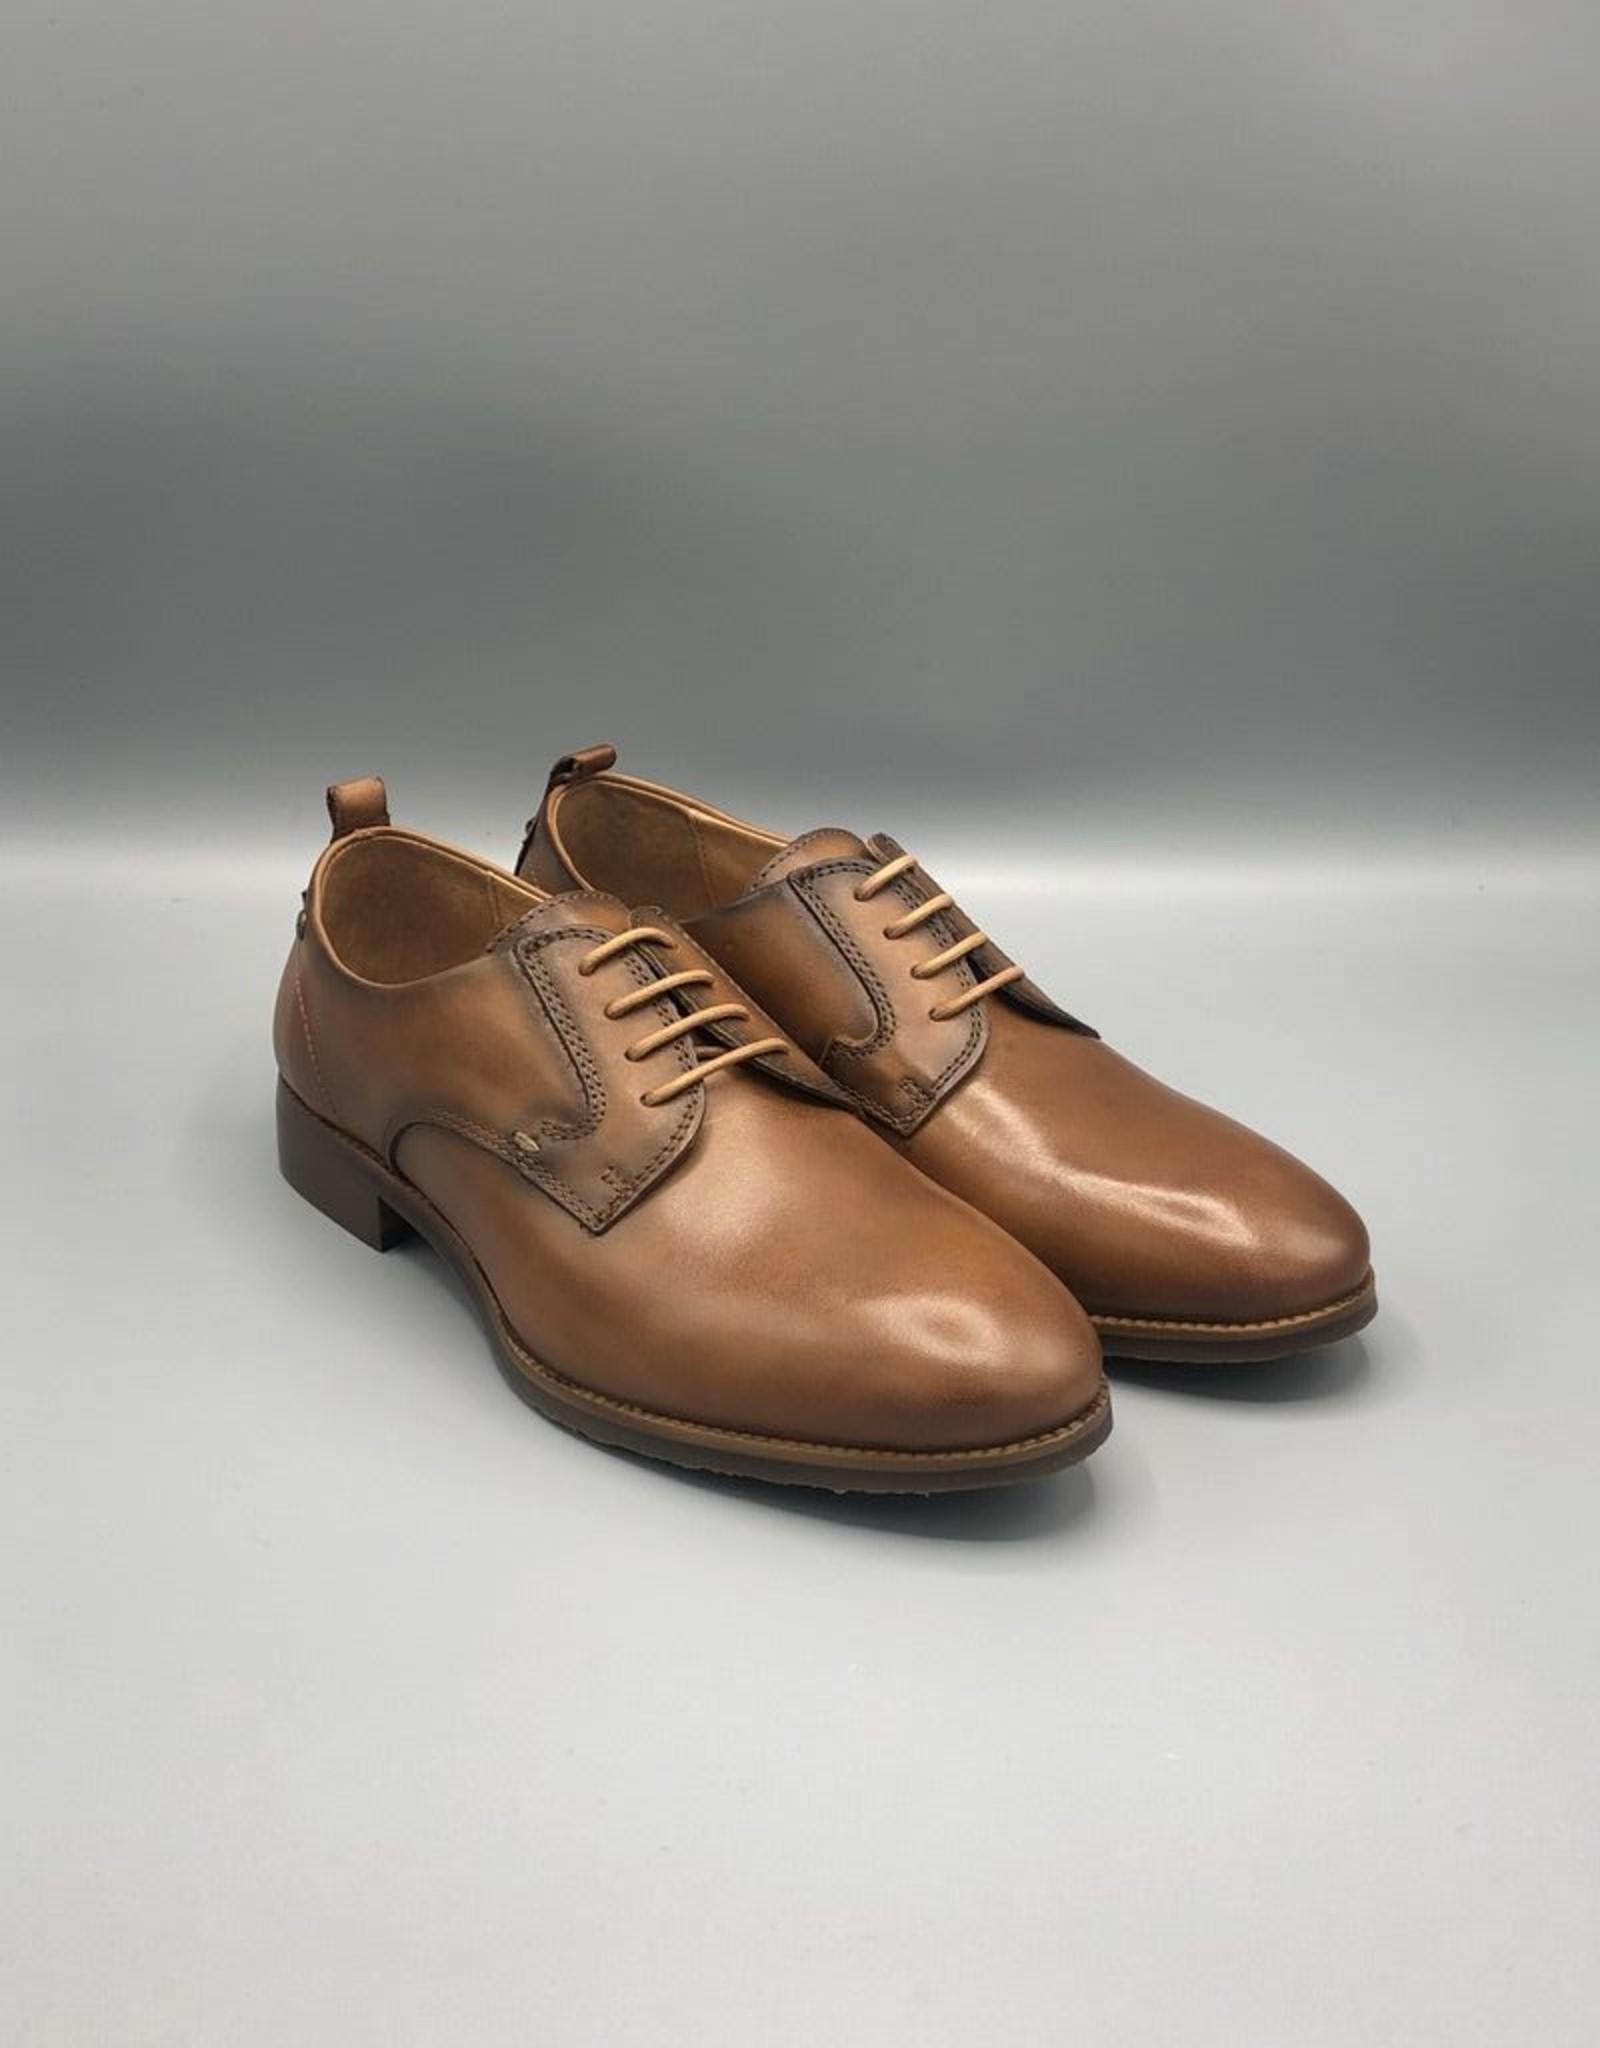 Pikolinos Pikolinos Royal Leather Derby Shoe